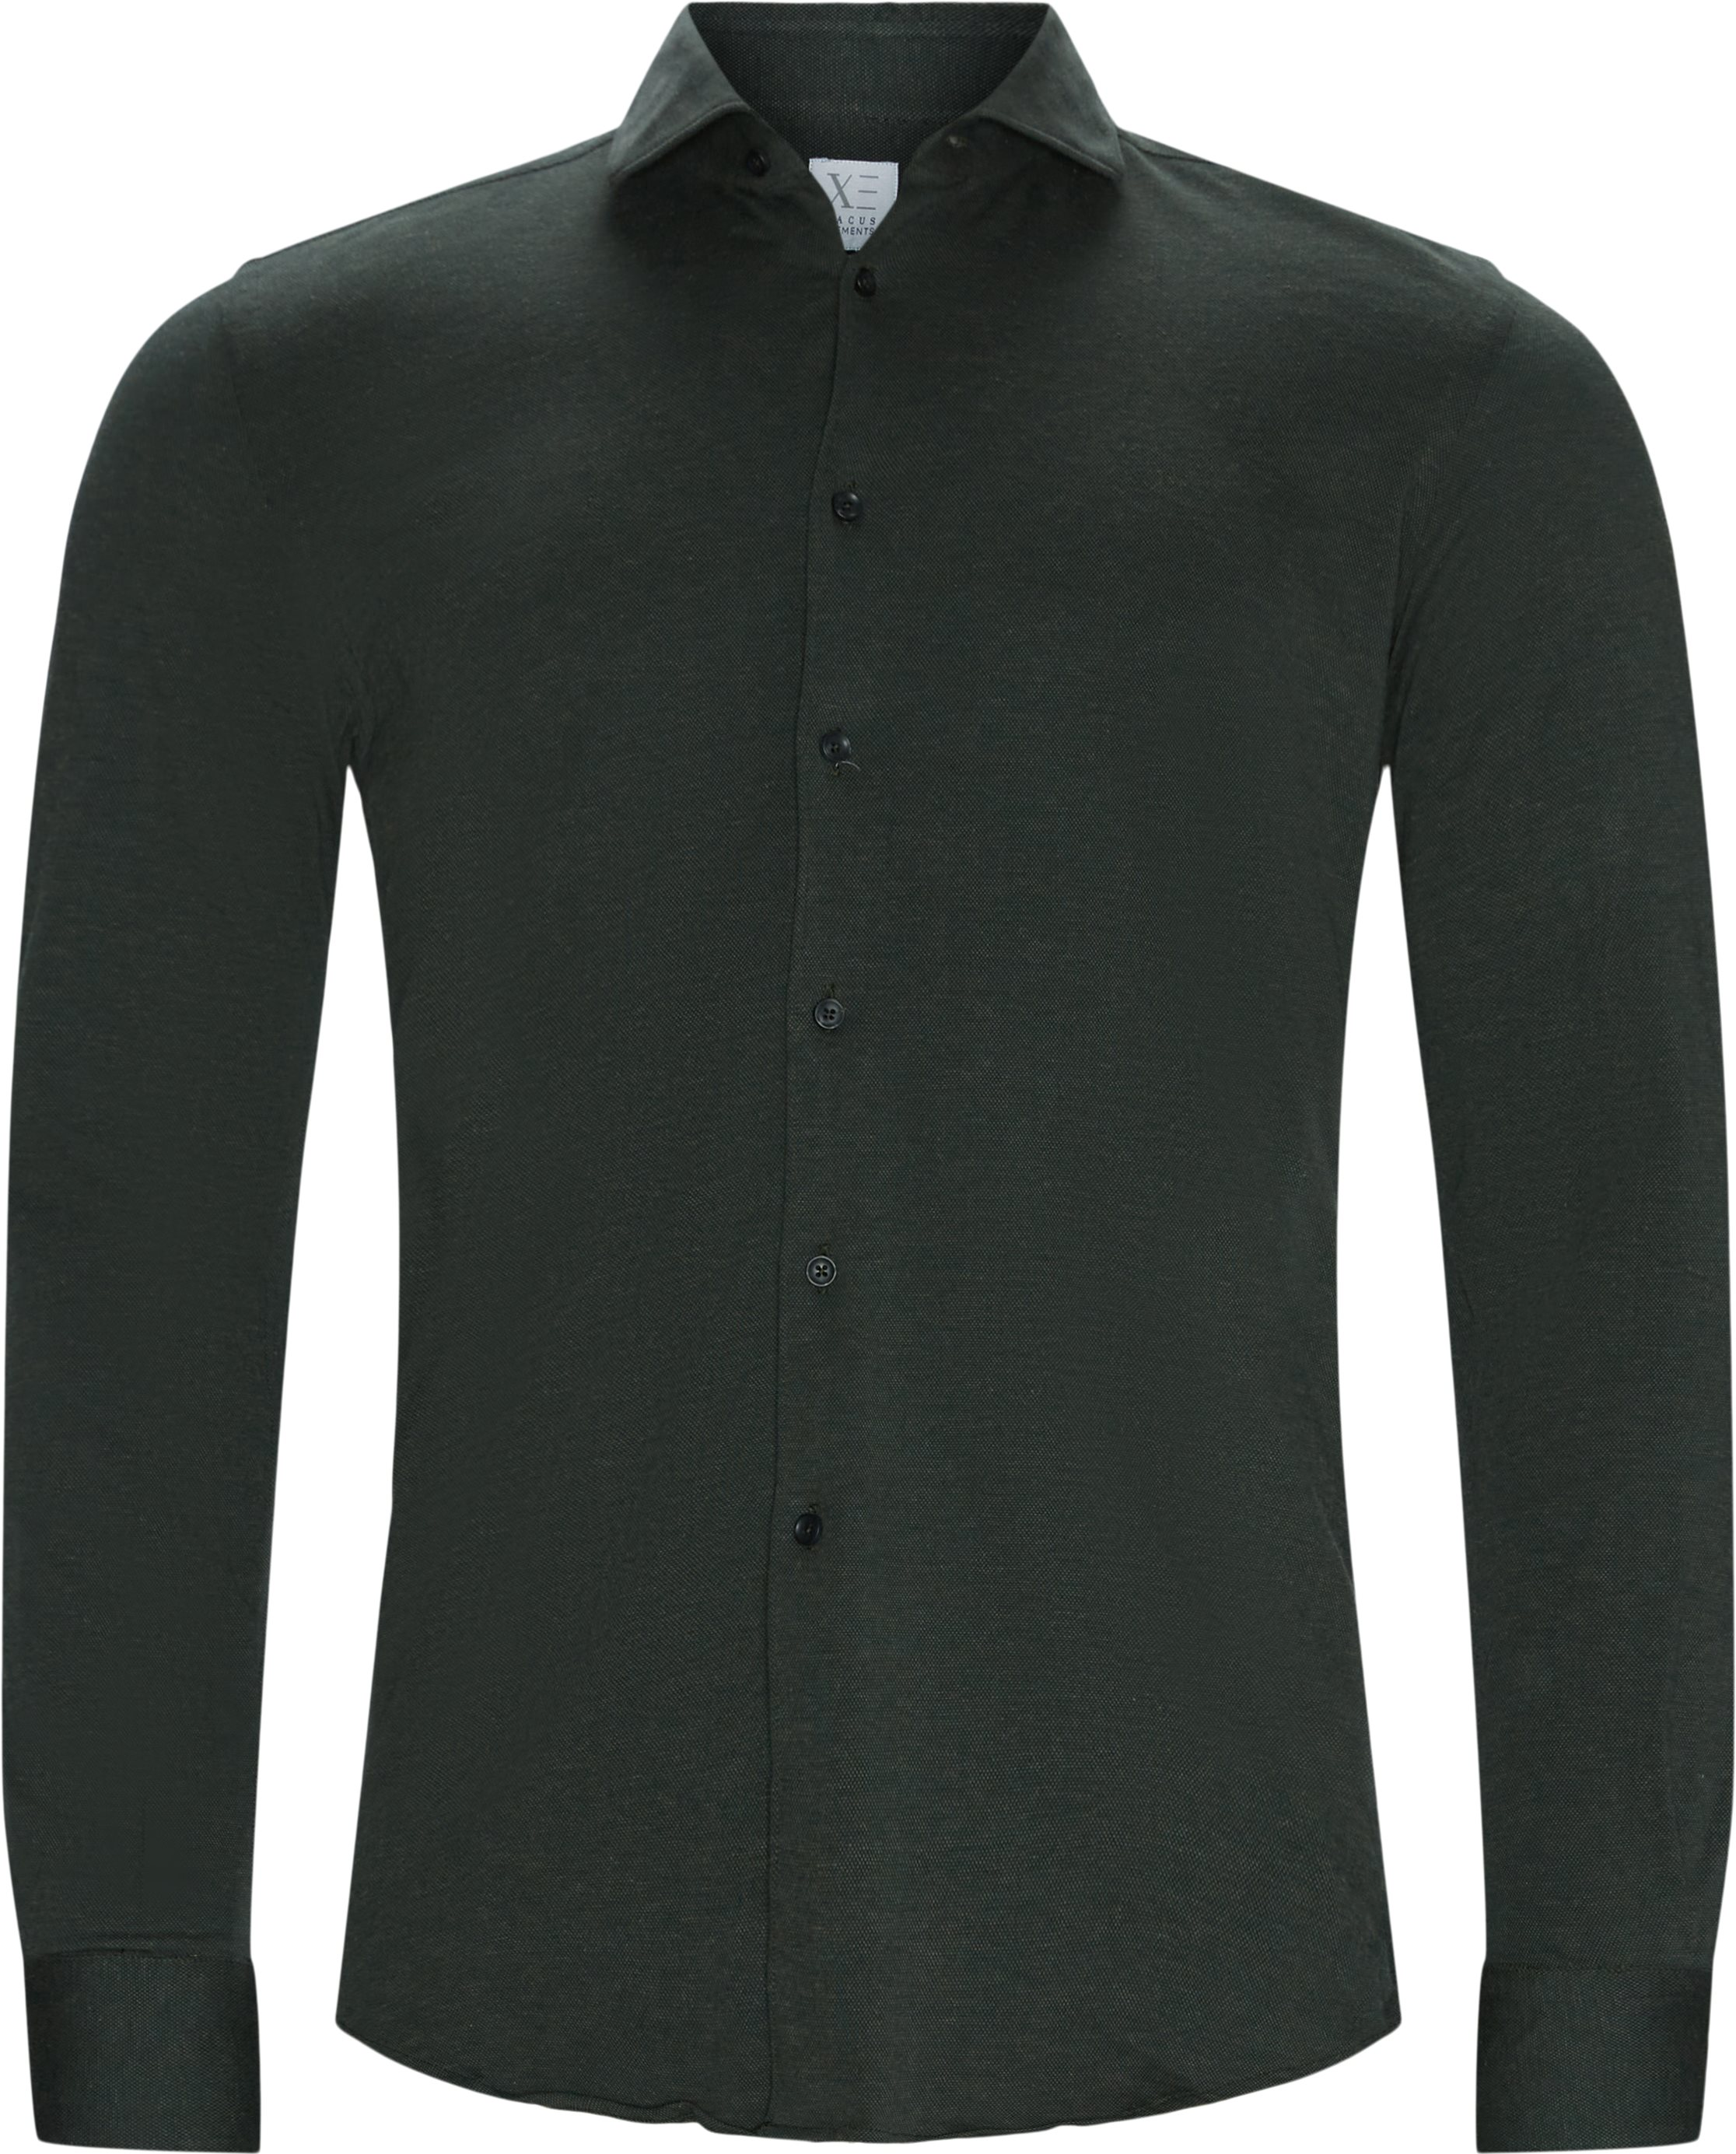 Classic Cotton Shirt - Skjorter - Slim fit - Grøn